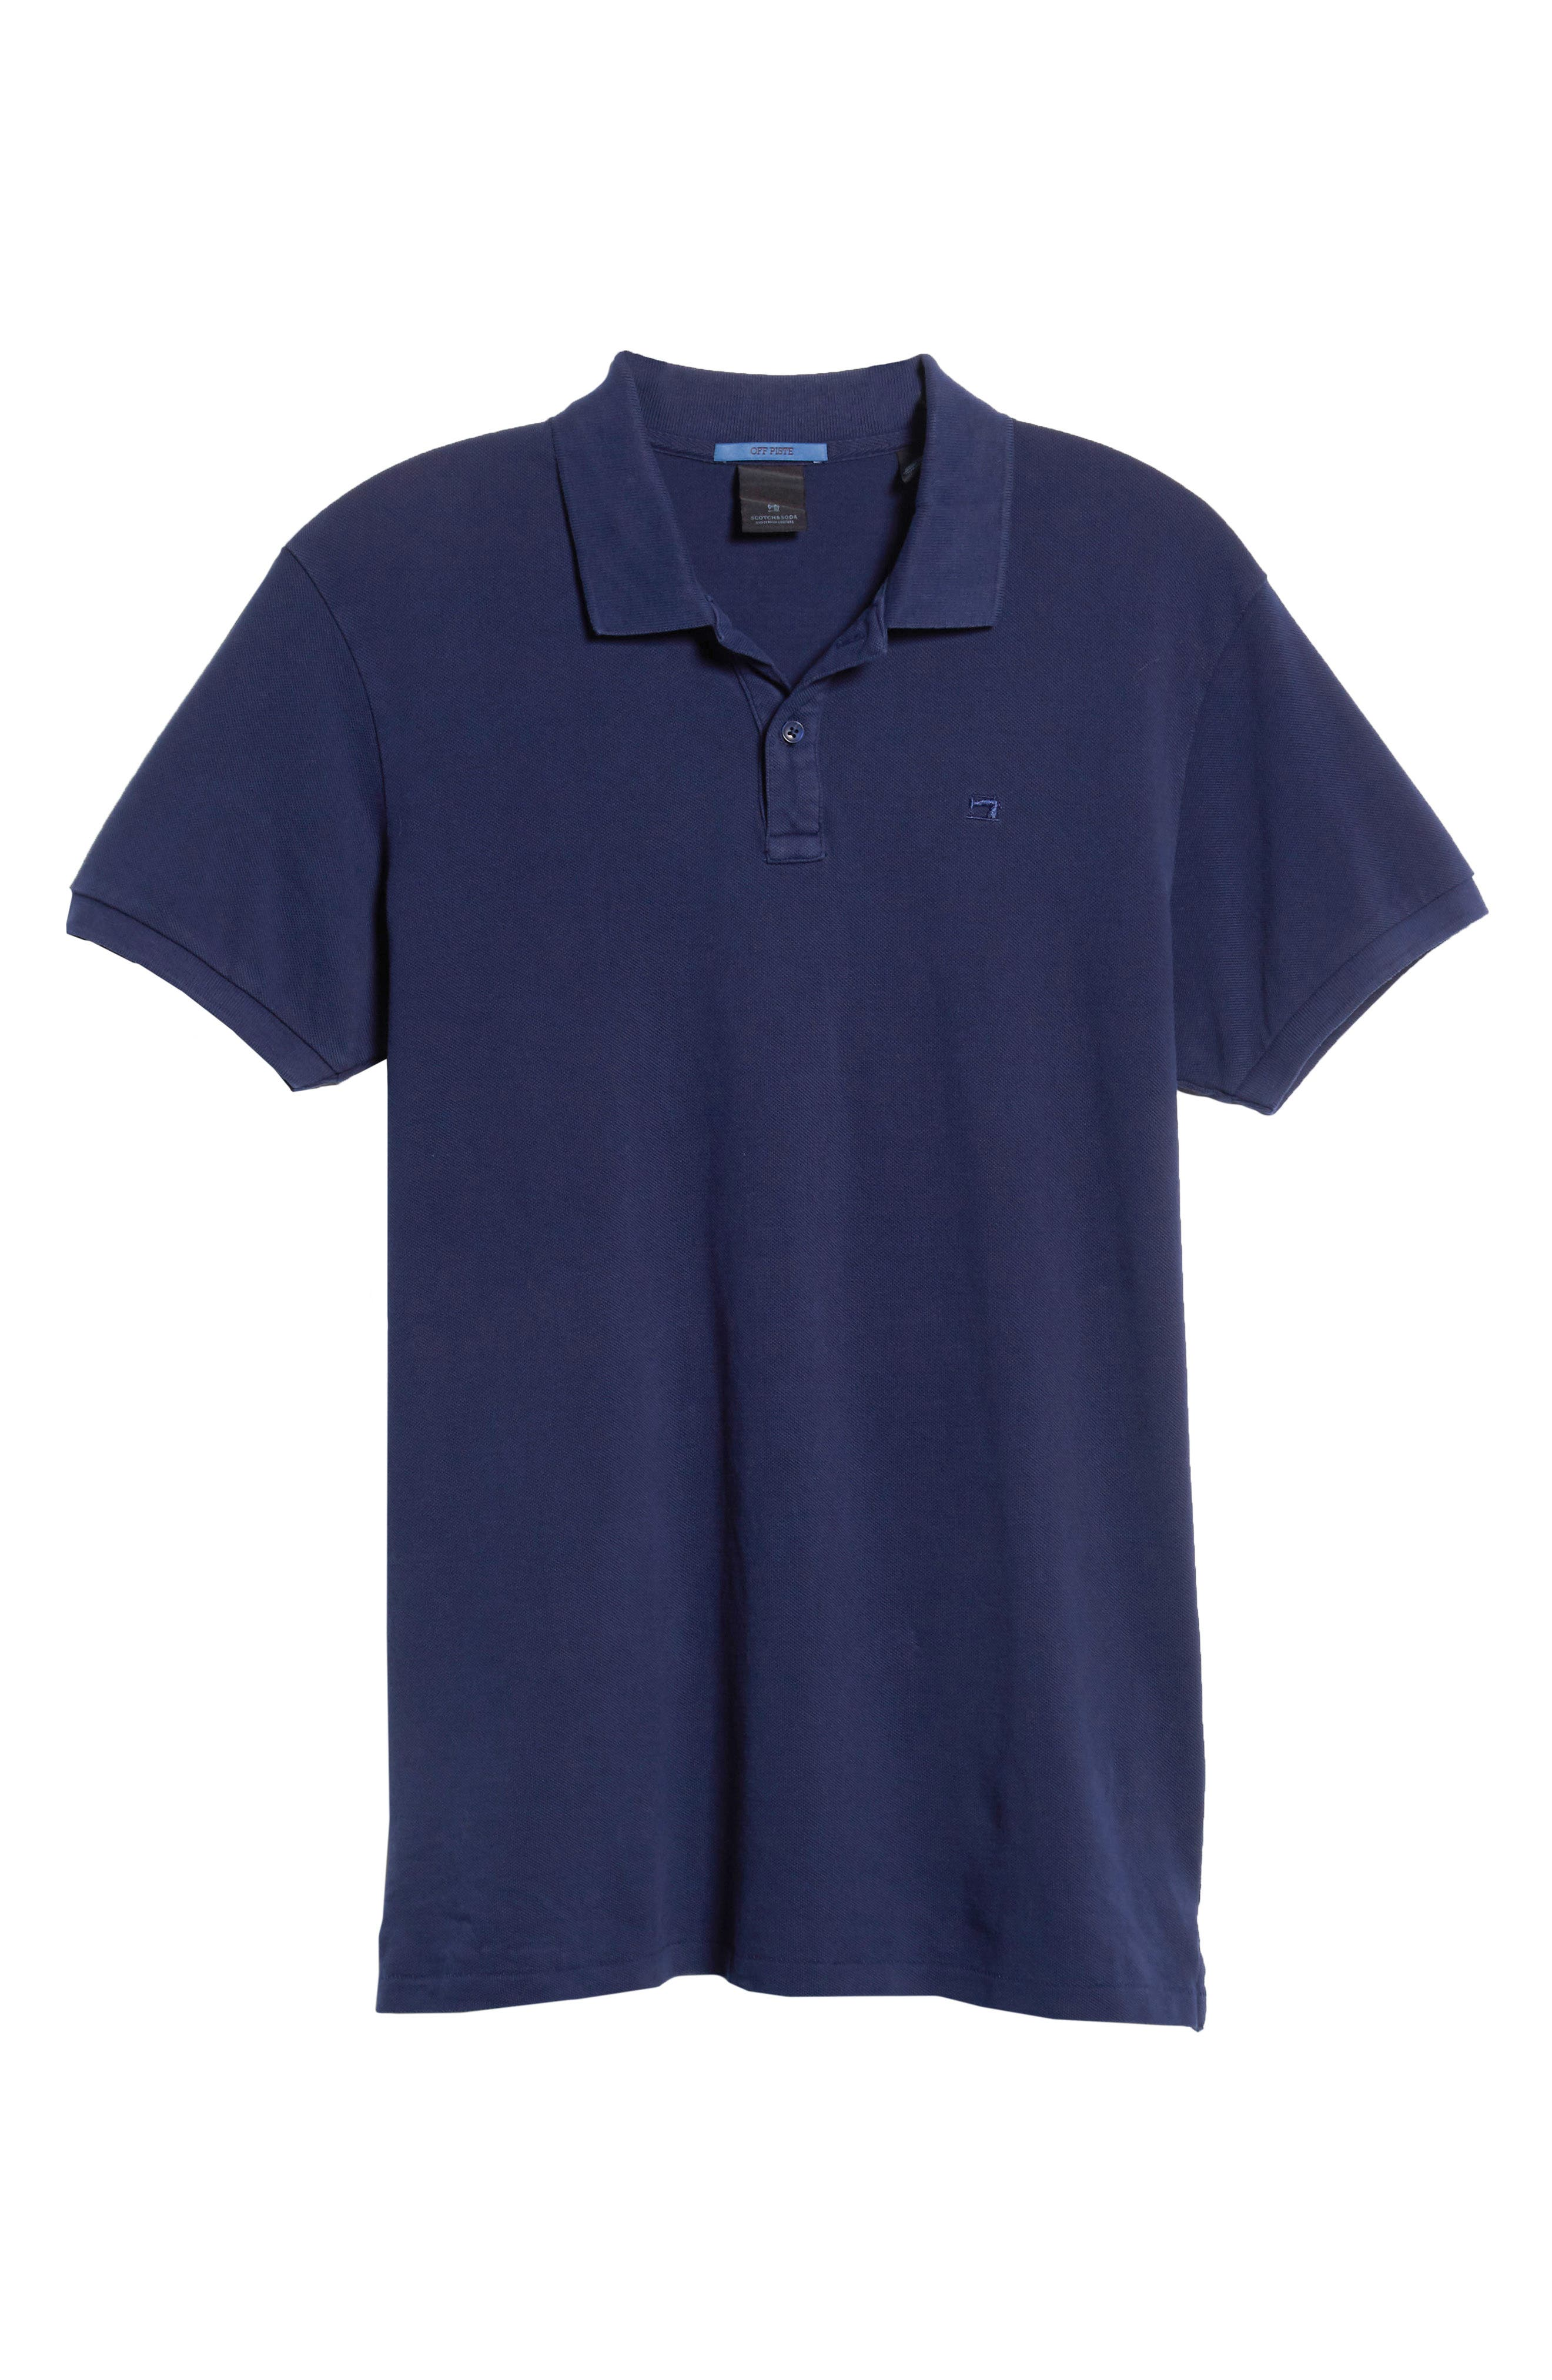 Garment Dyed Piqué Polo,                             Alternate thumbnail 6, color,                             410